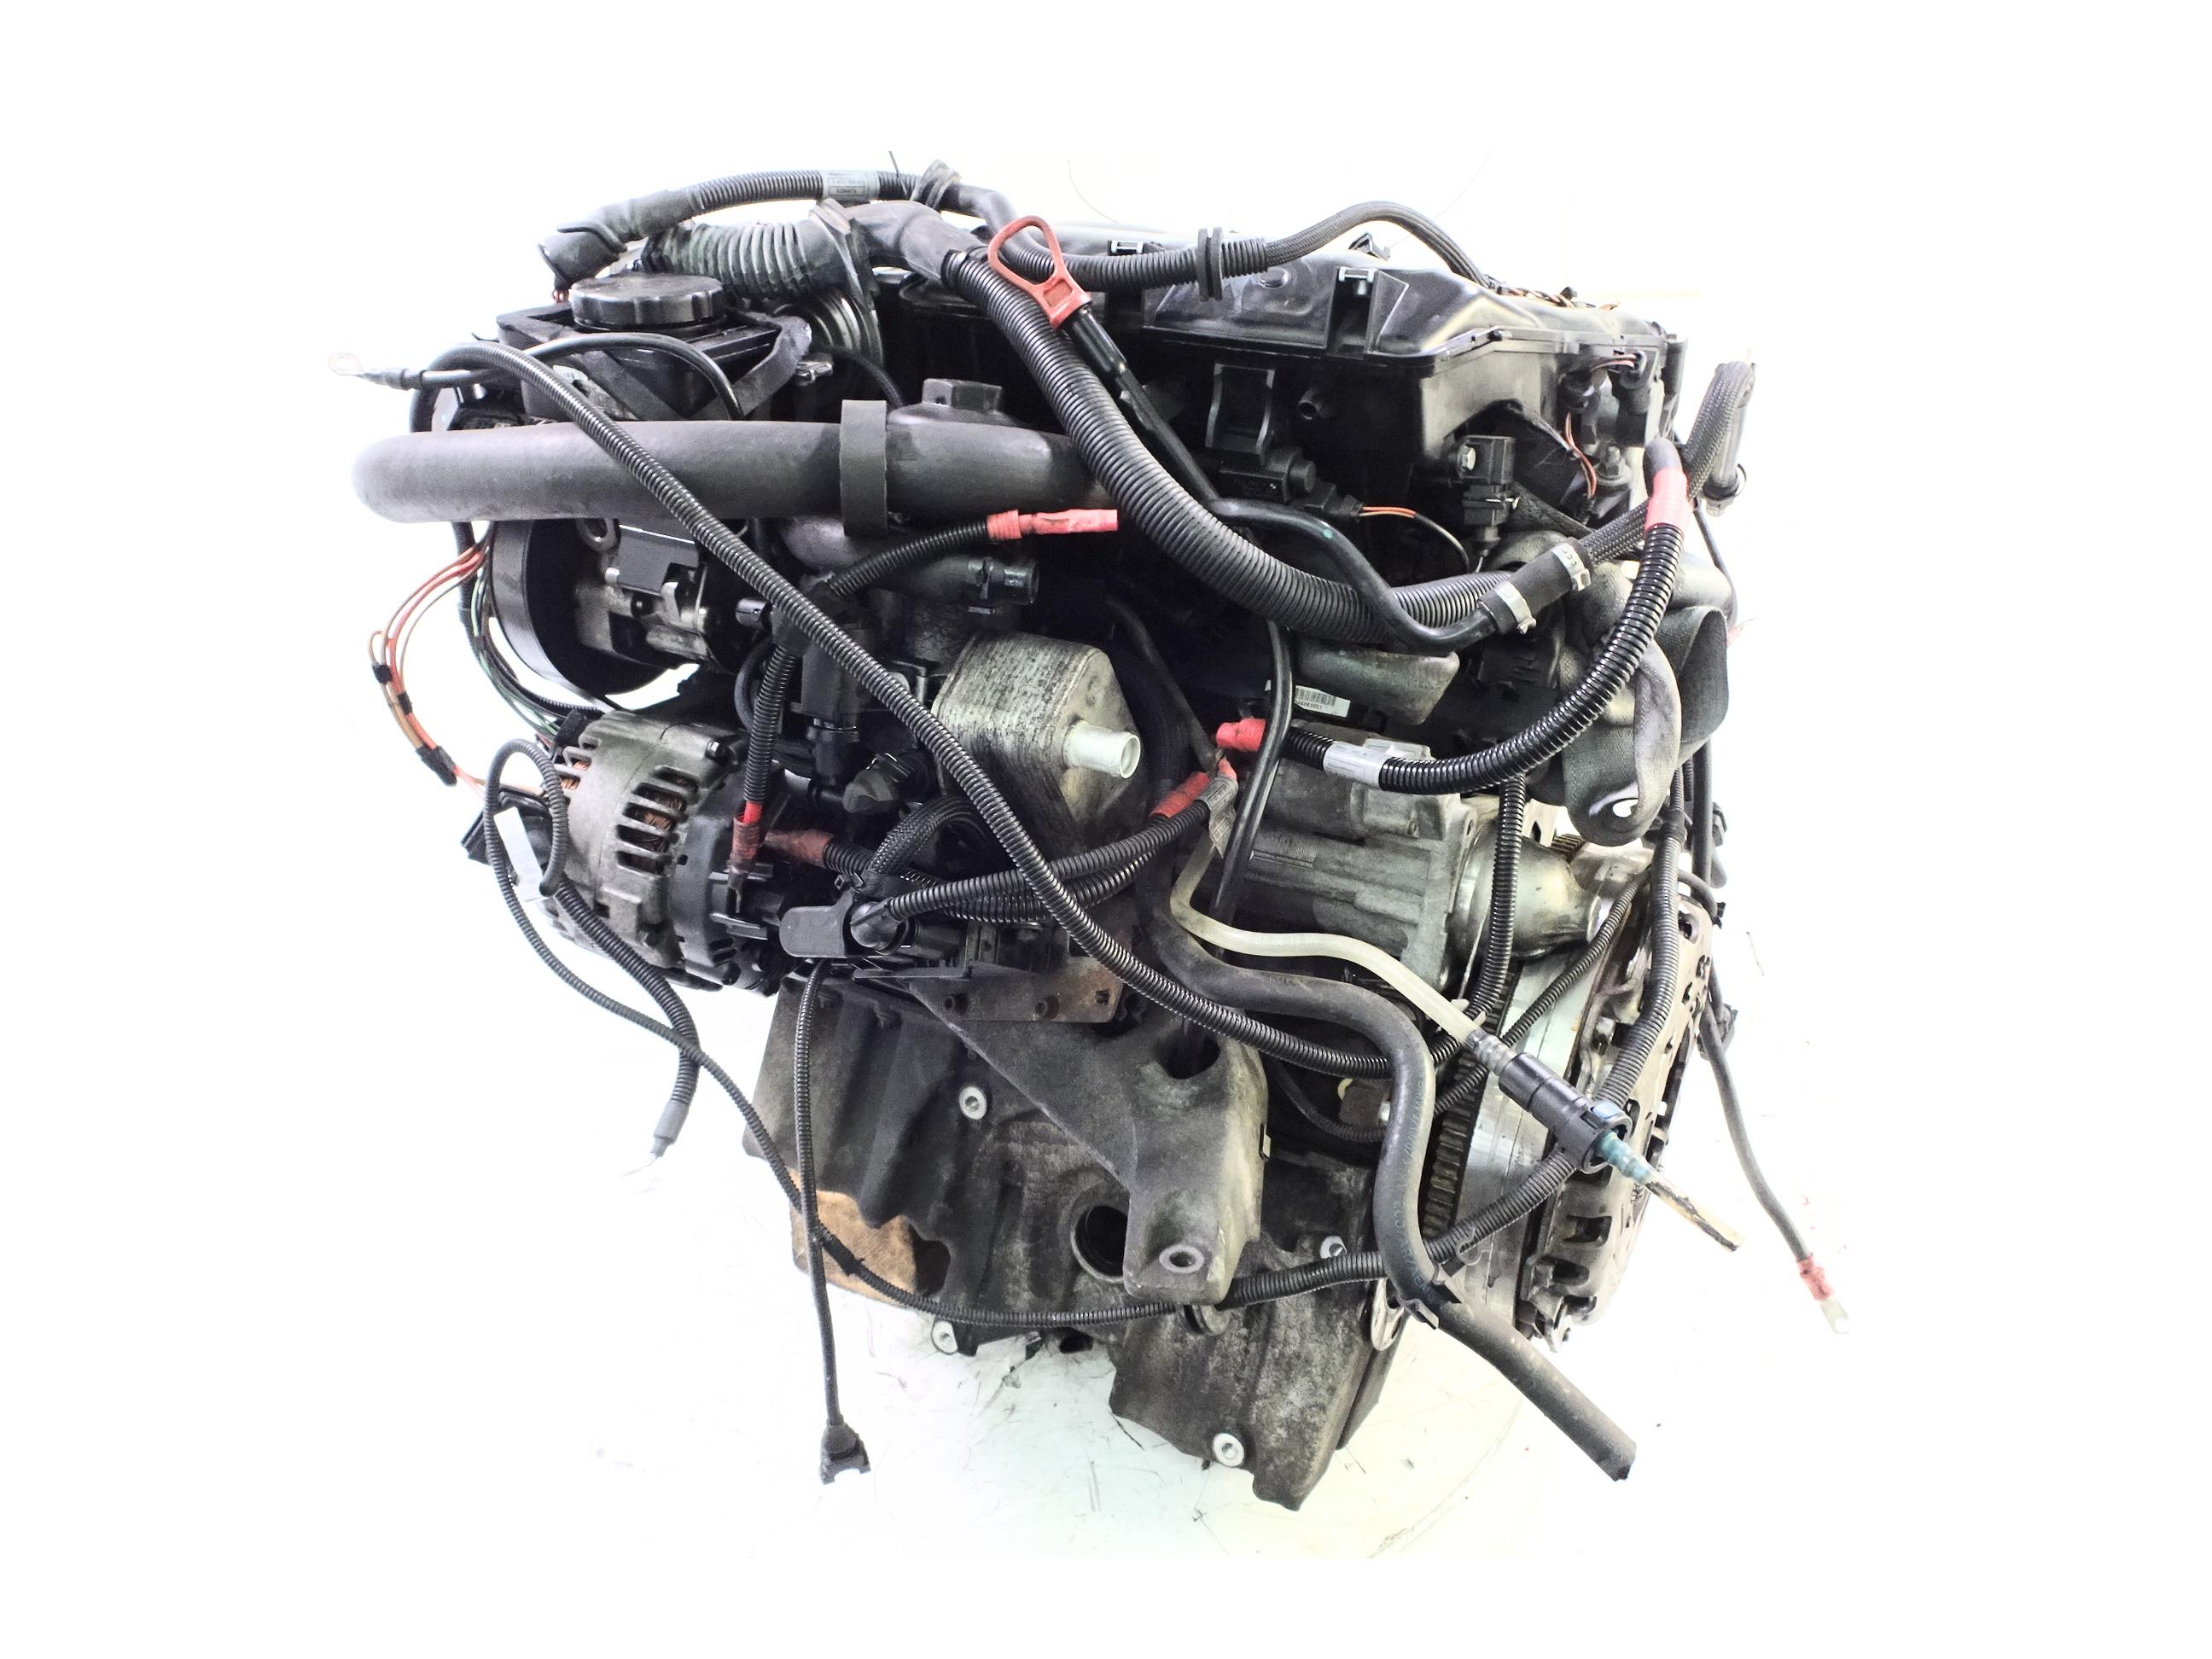 Motor 2007 BMW 2,0 d Diesel M47D20 204D4 mit Anbauteilen DE338773